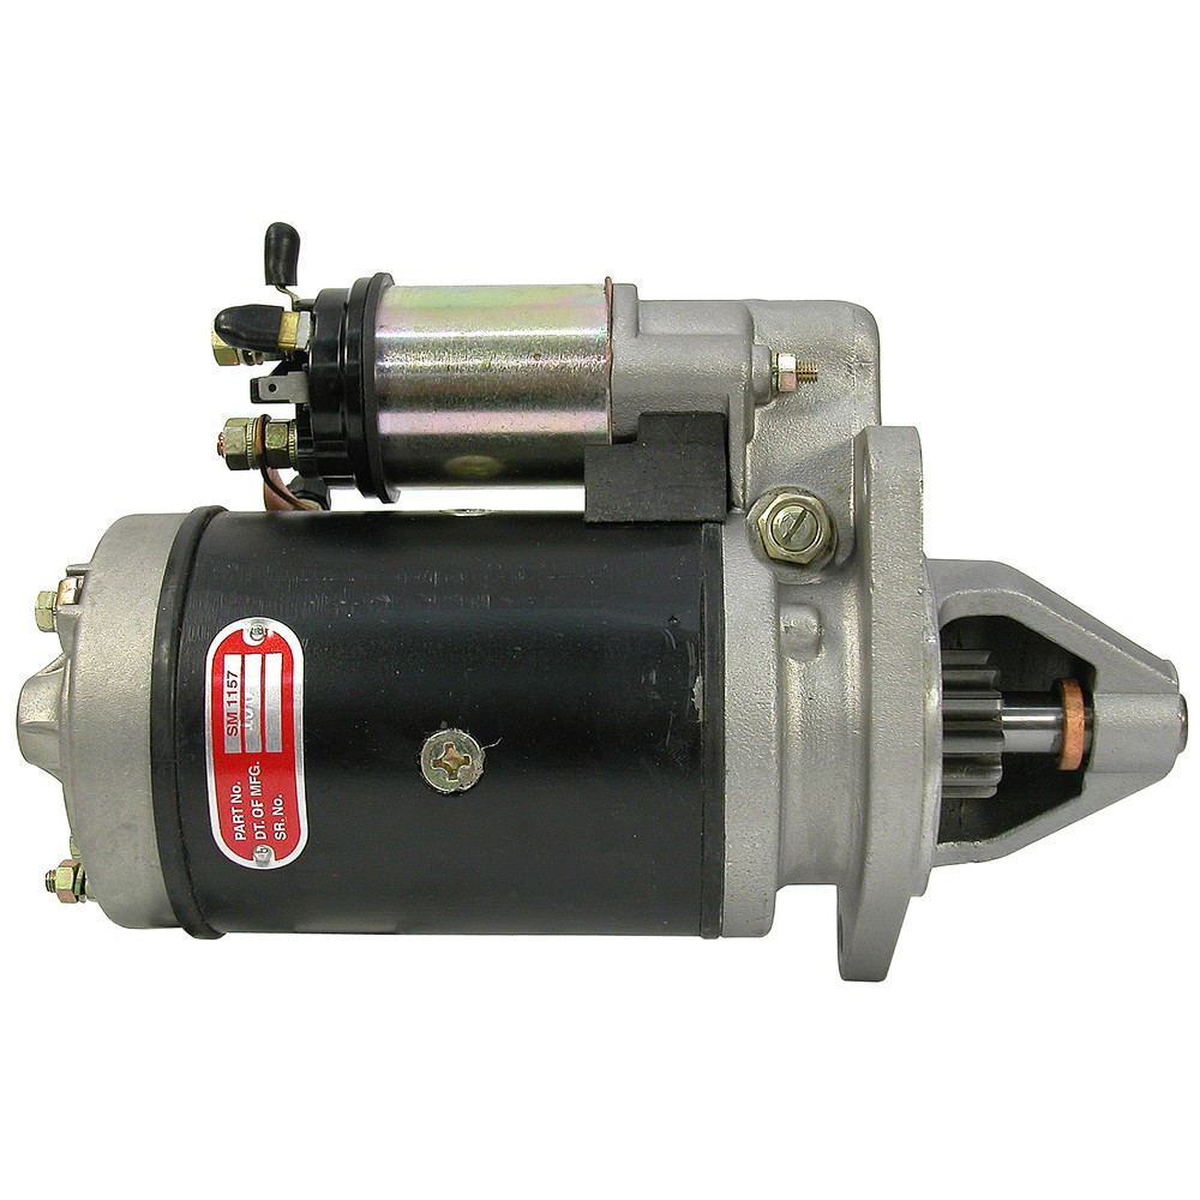 STARTER LUCAS DB,FE35 4-CYLIN